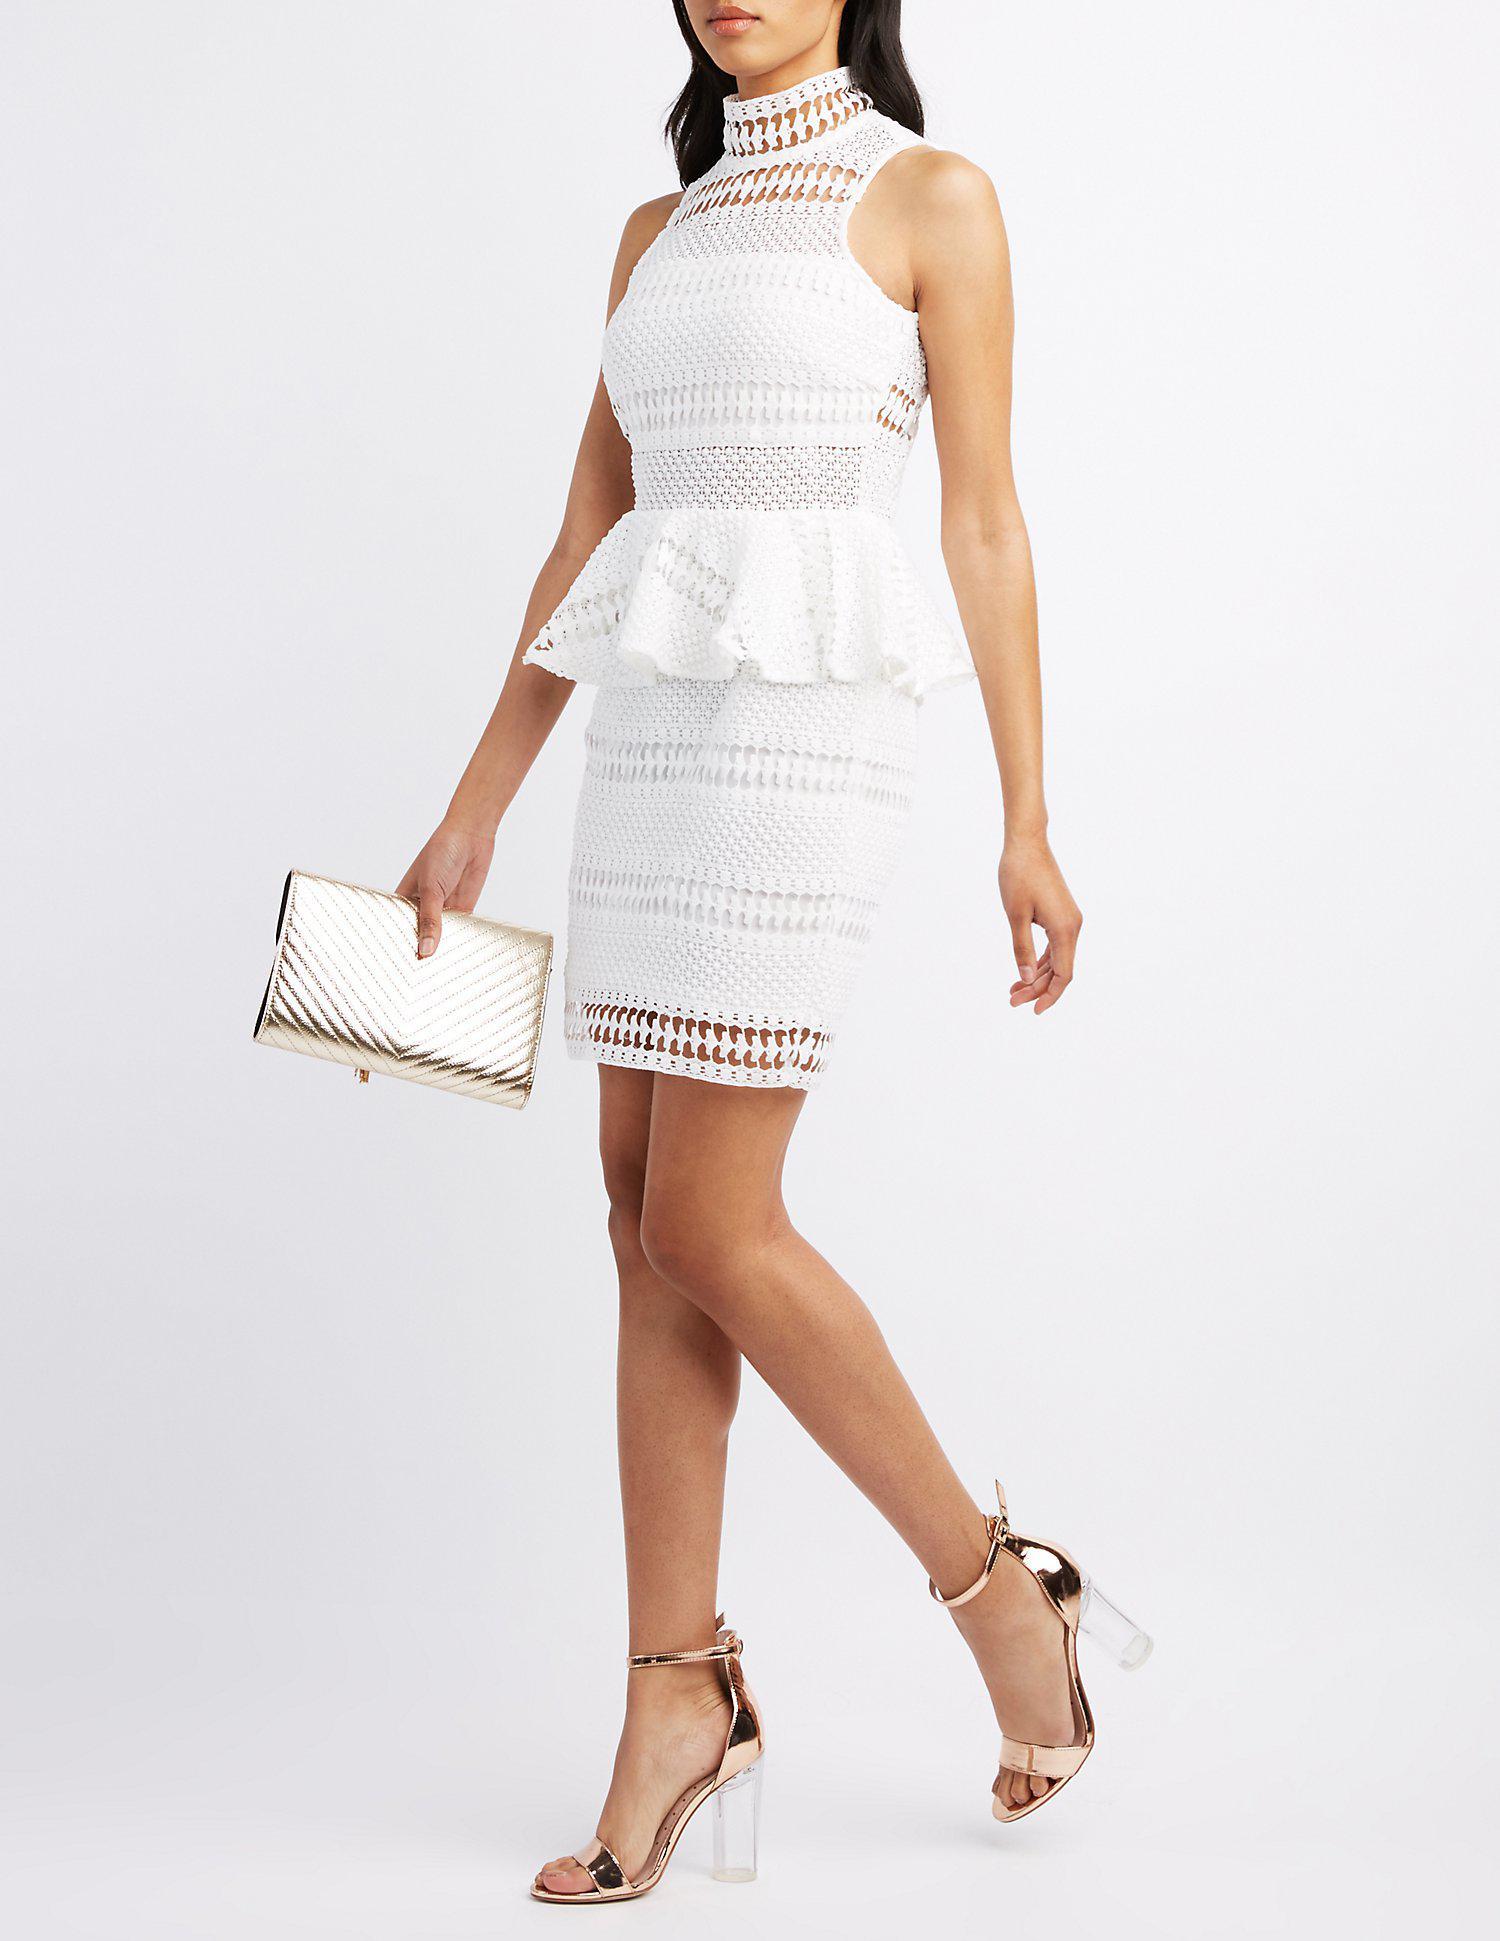 292d27ace8 Lyst - Charlotte Russe Crochet Lace Mock Neck Peplum Dress in White